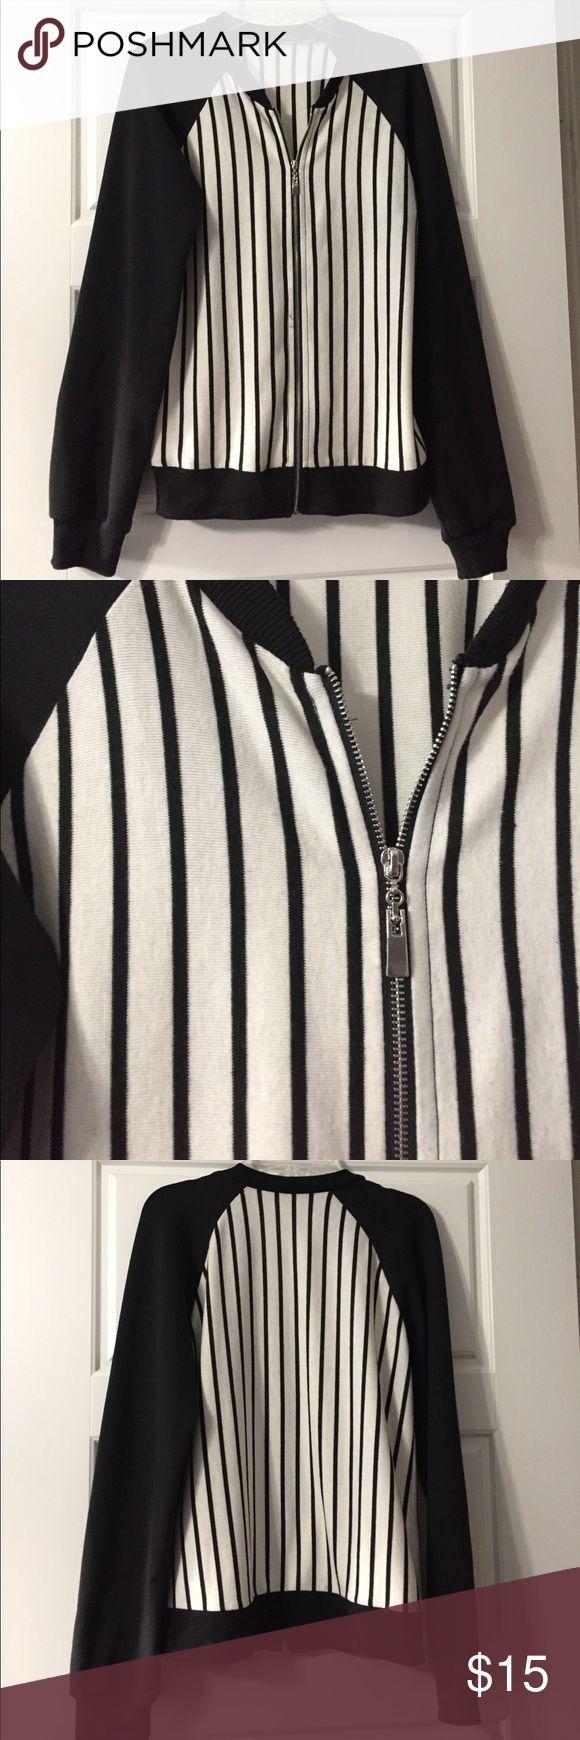 Black and white baseball jacket L Black and white baseball jacket L Jackets & Coats